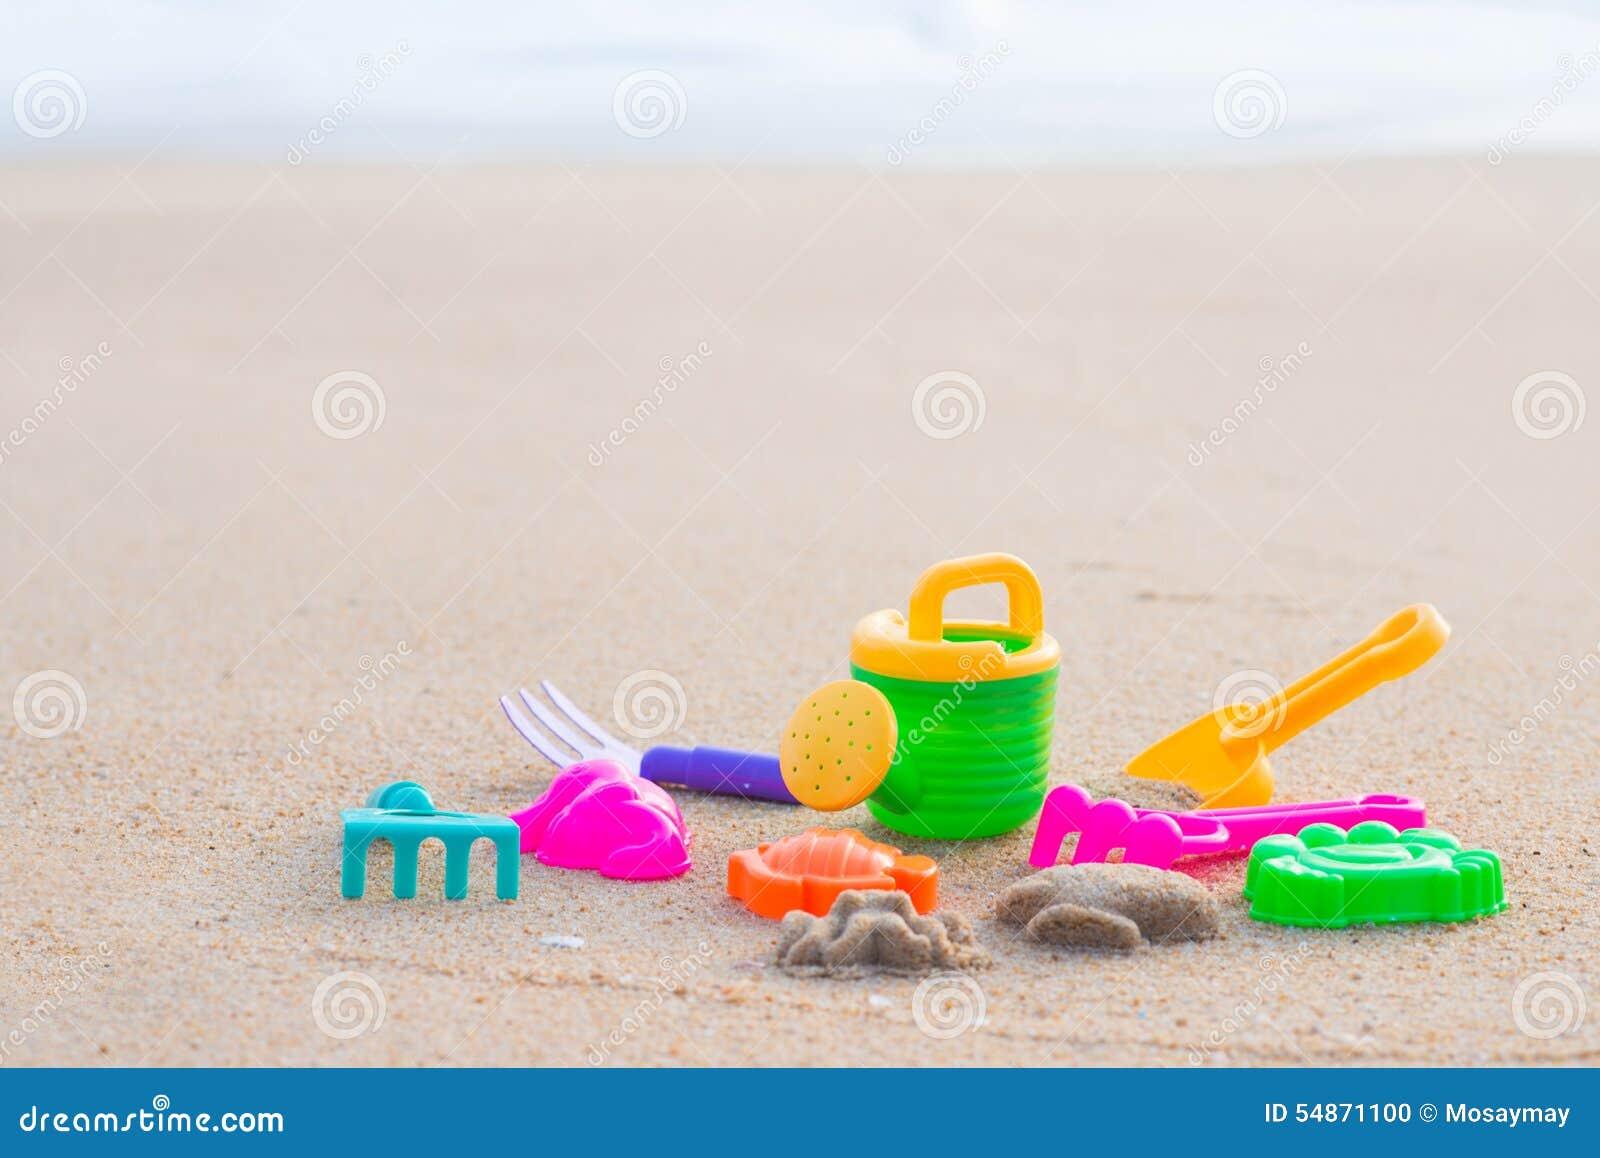 Download Sand Beach Toy Set For Kids Stock Photo - Image of rake, animal: 54871100